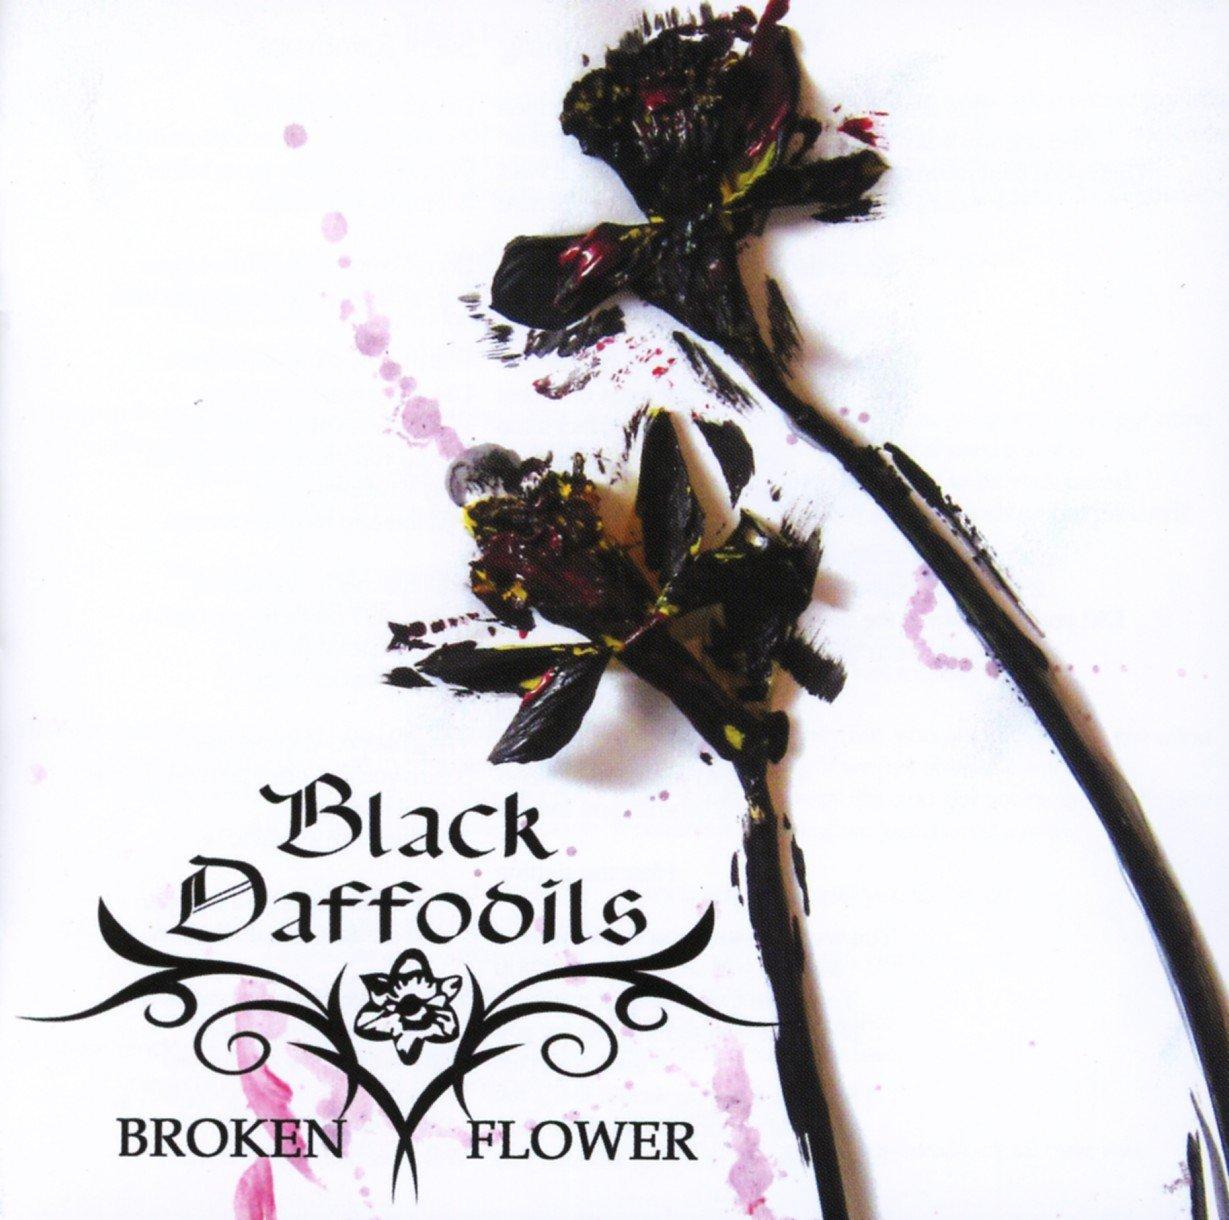 Black Daffodils - Broken Flower